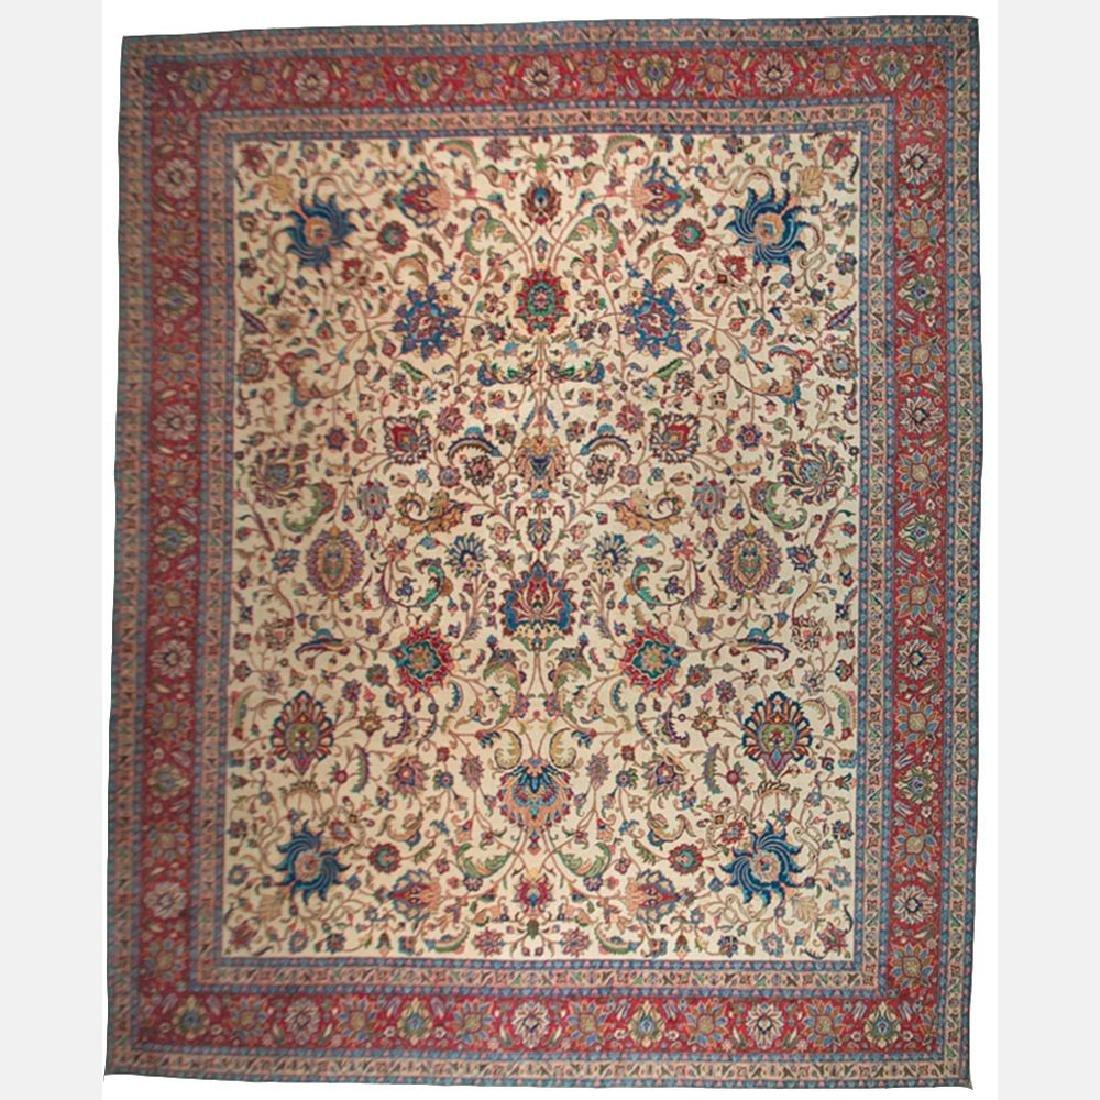 A Persian Mashad Wool Rug, 20th Century.